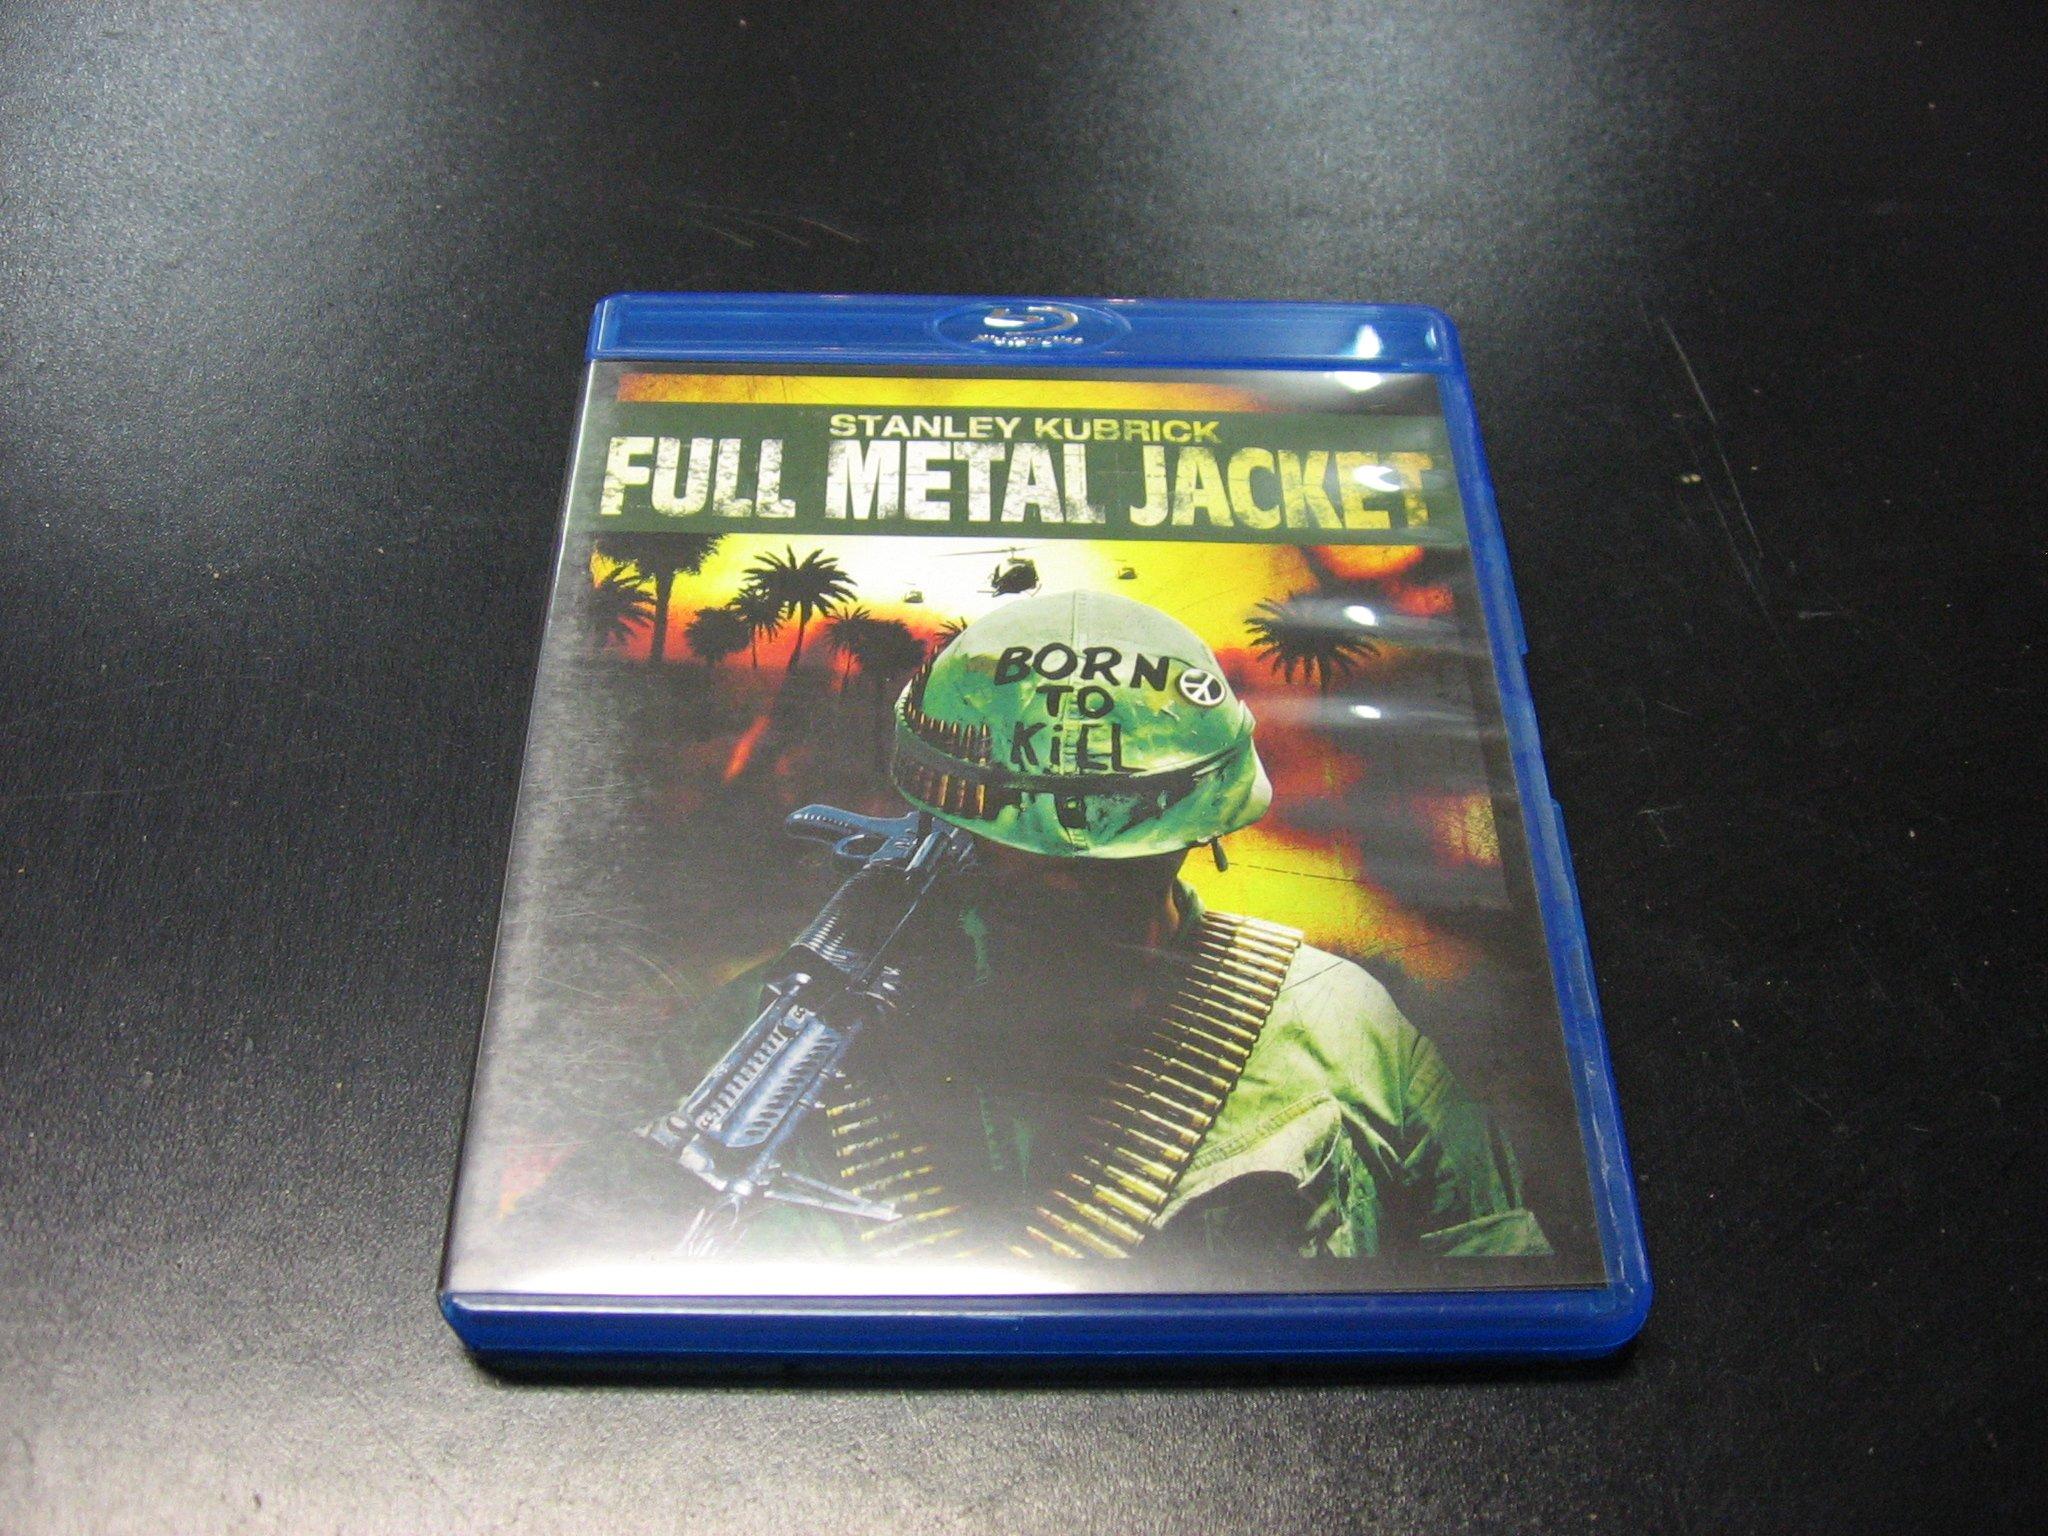 FULL METAL JACKET 007 `````````` Blu-rey ```````````` Opole